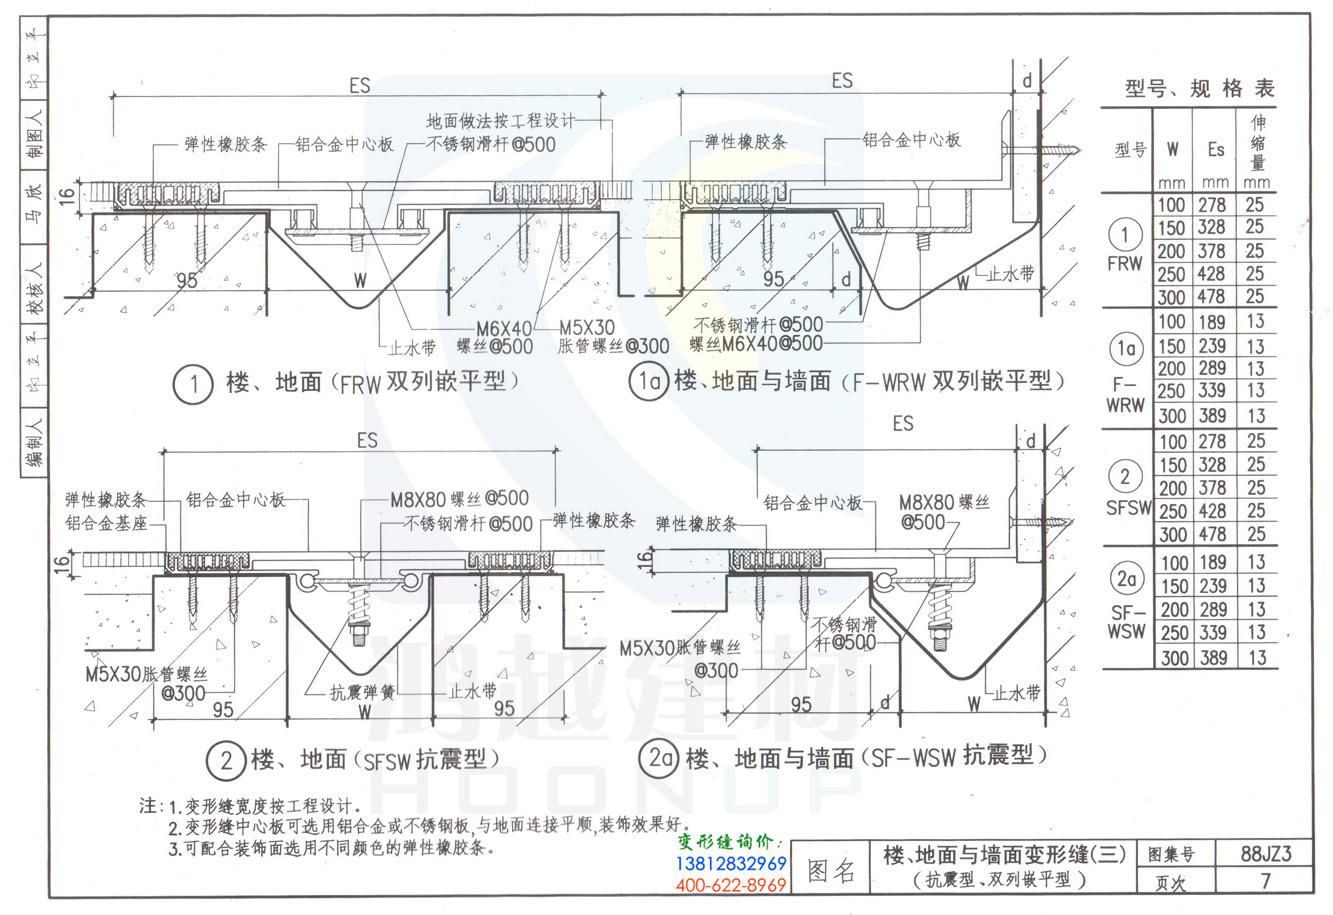 88JZ3变形缝图集第7页